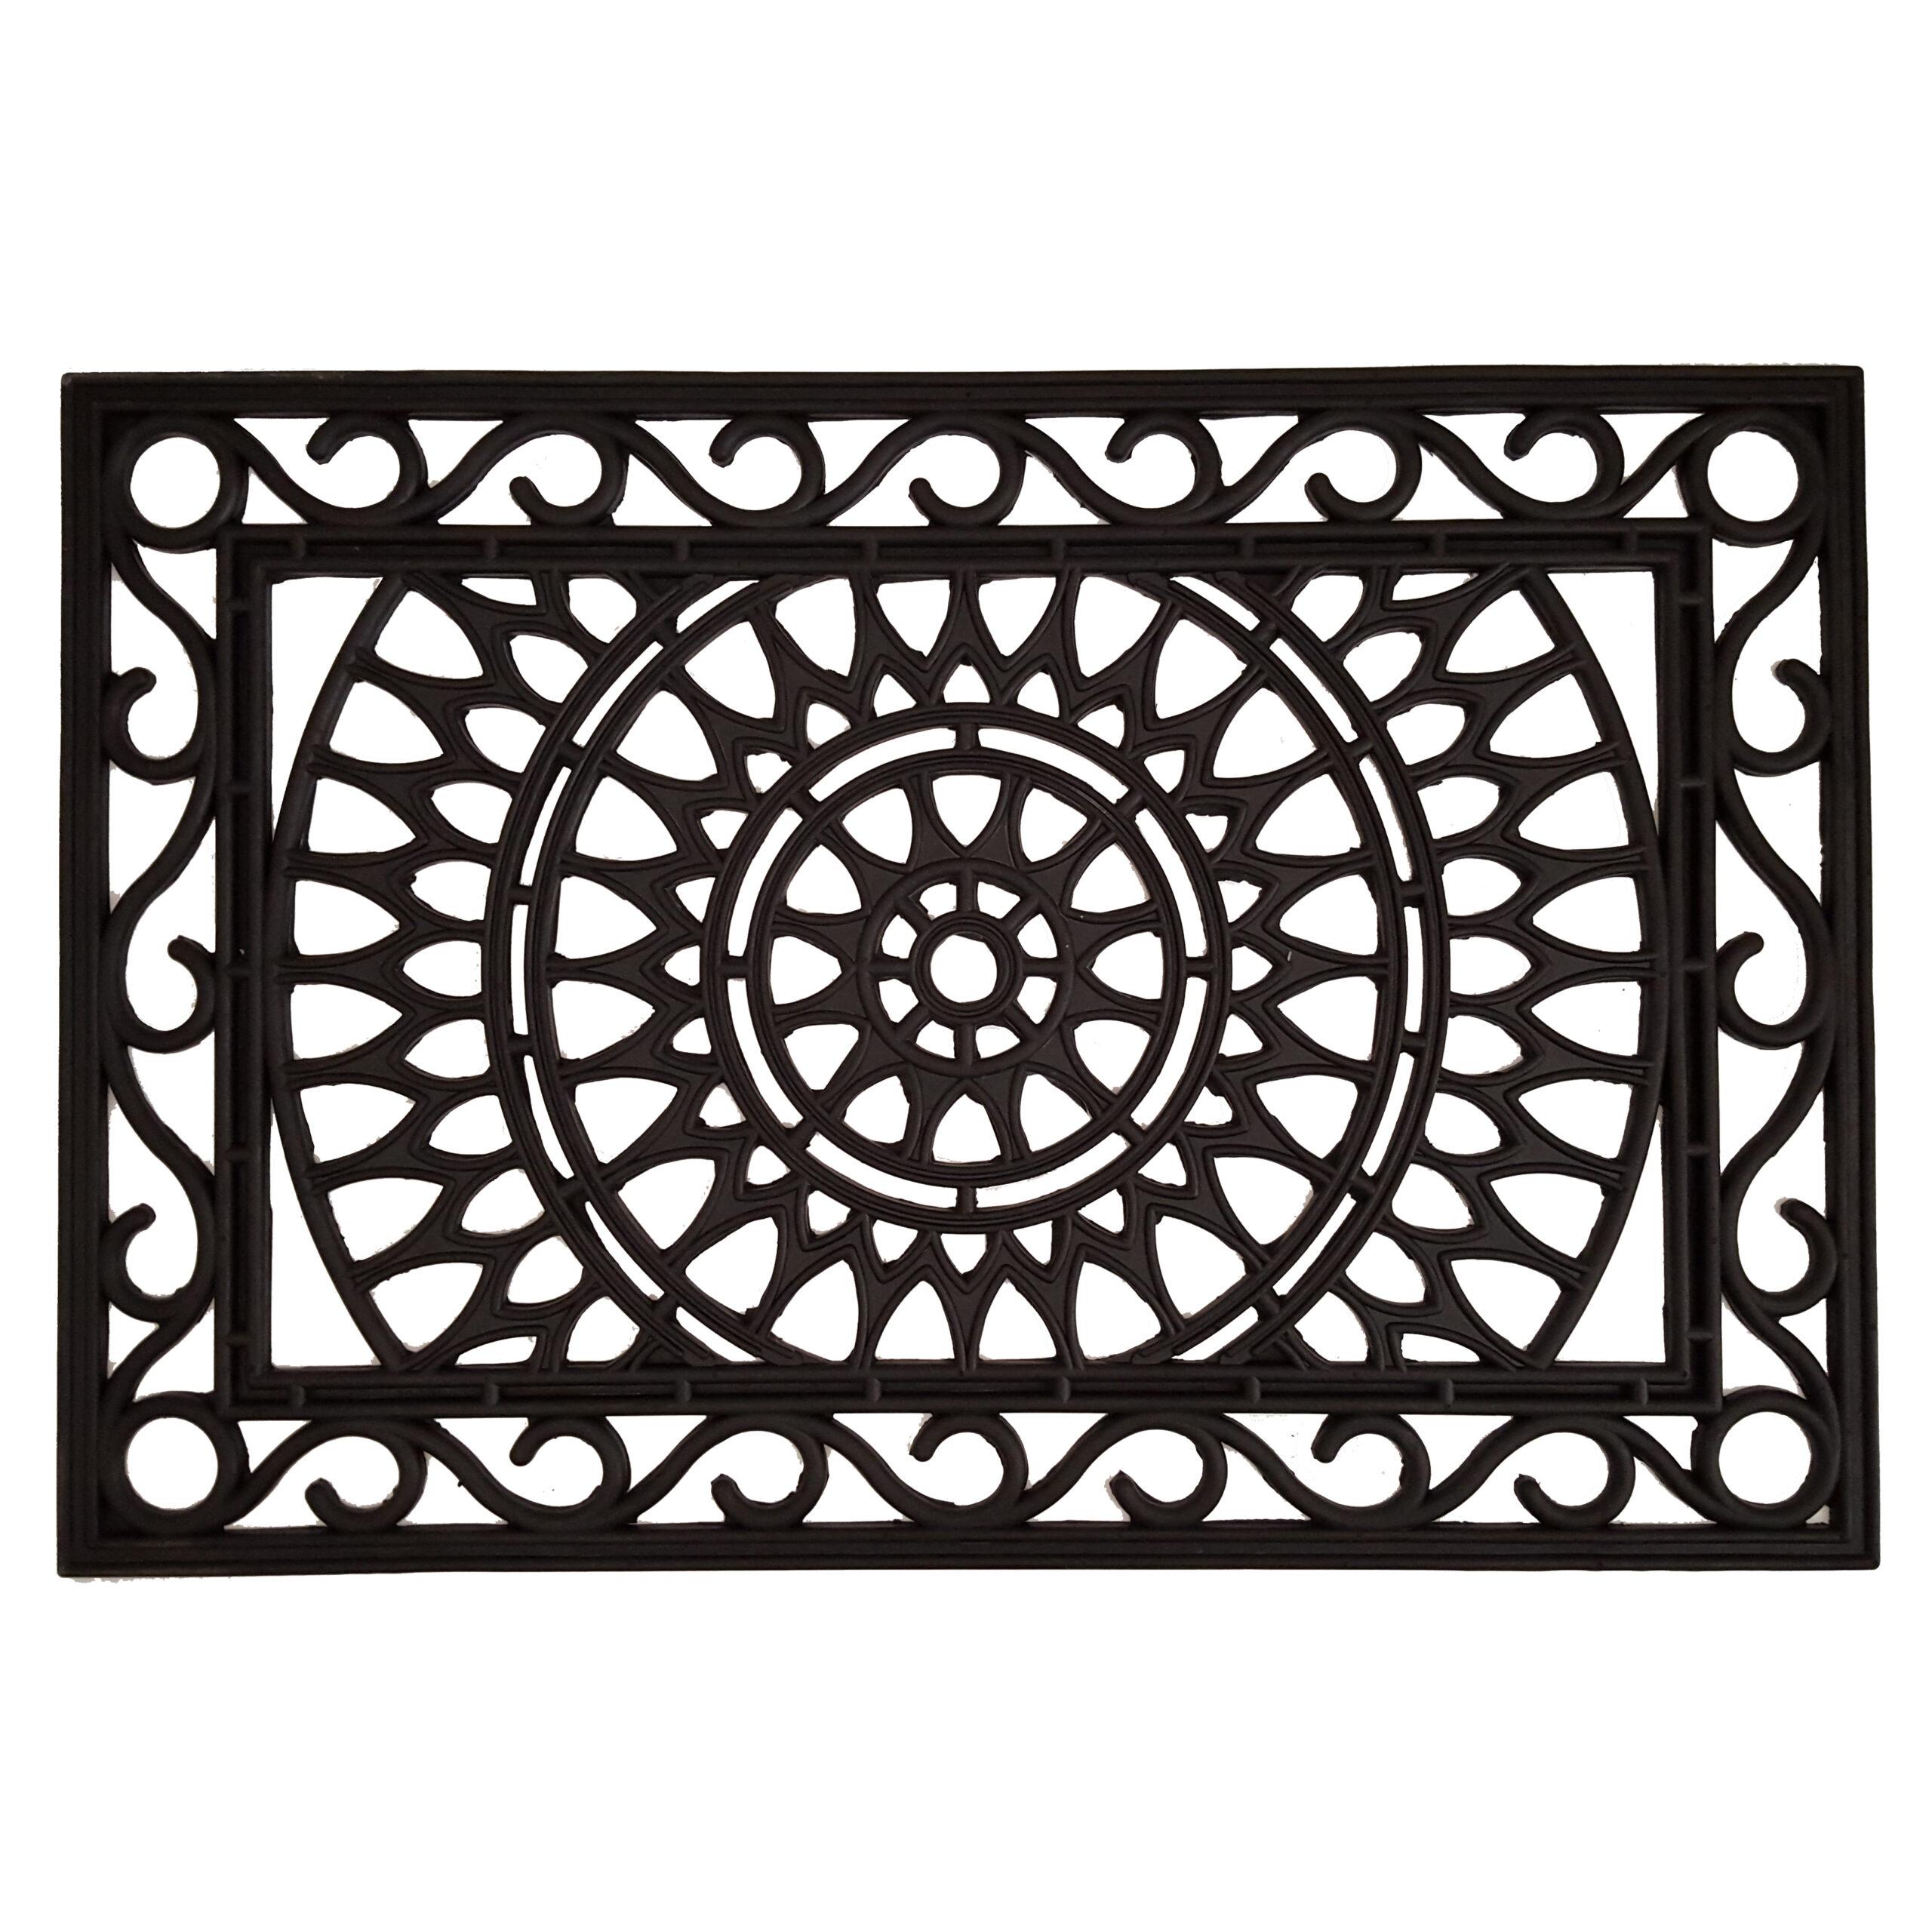 "Sungate Rubber Doormat 24"" x 36"""